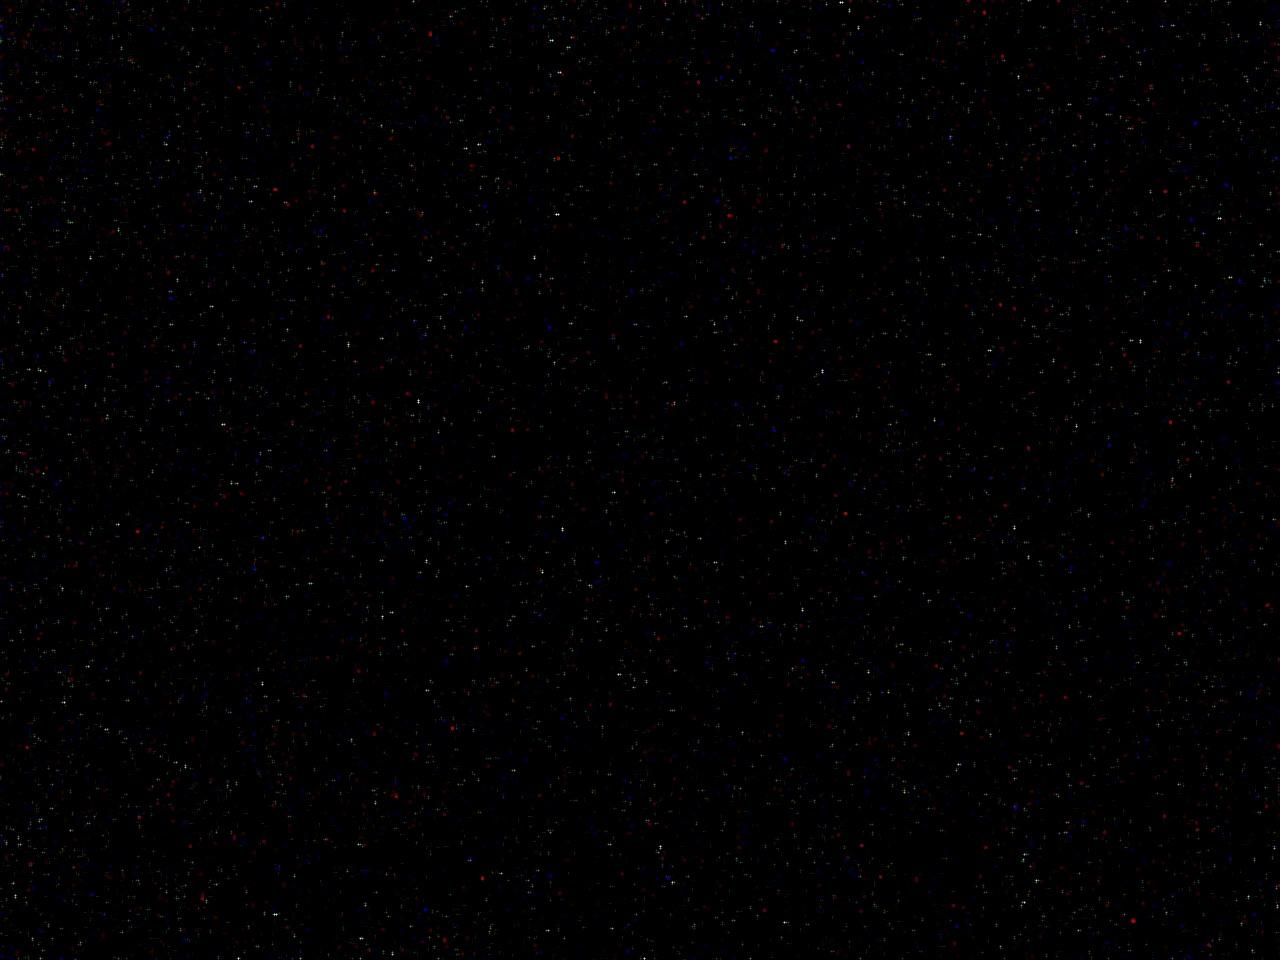 C_Dark00.jpg